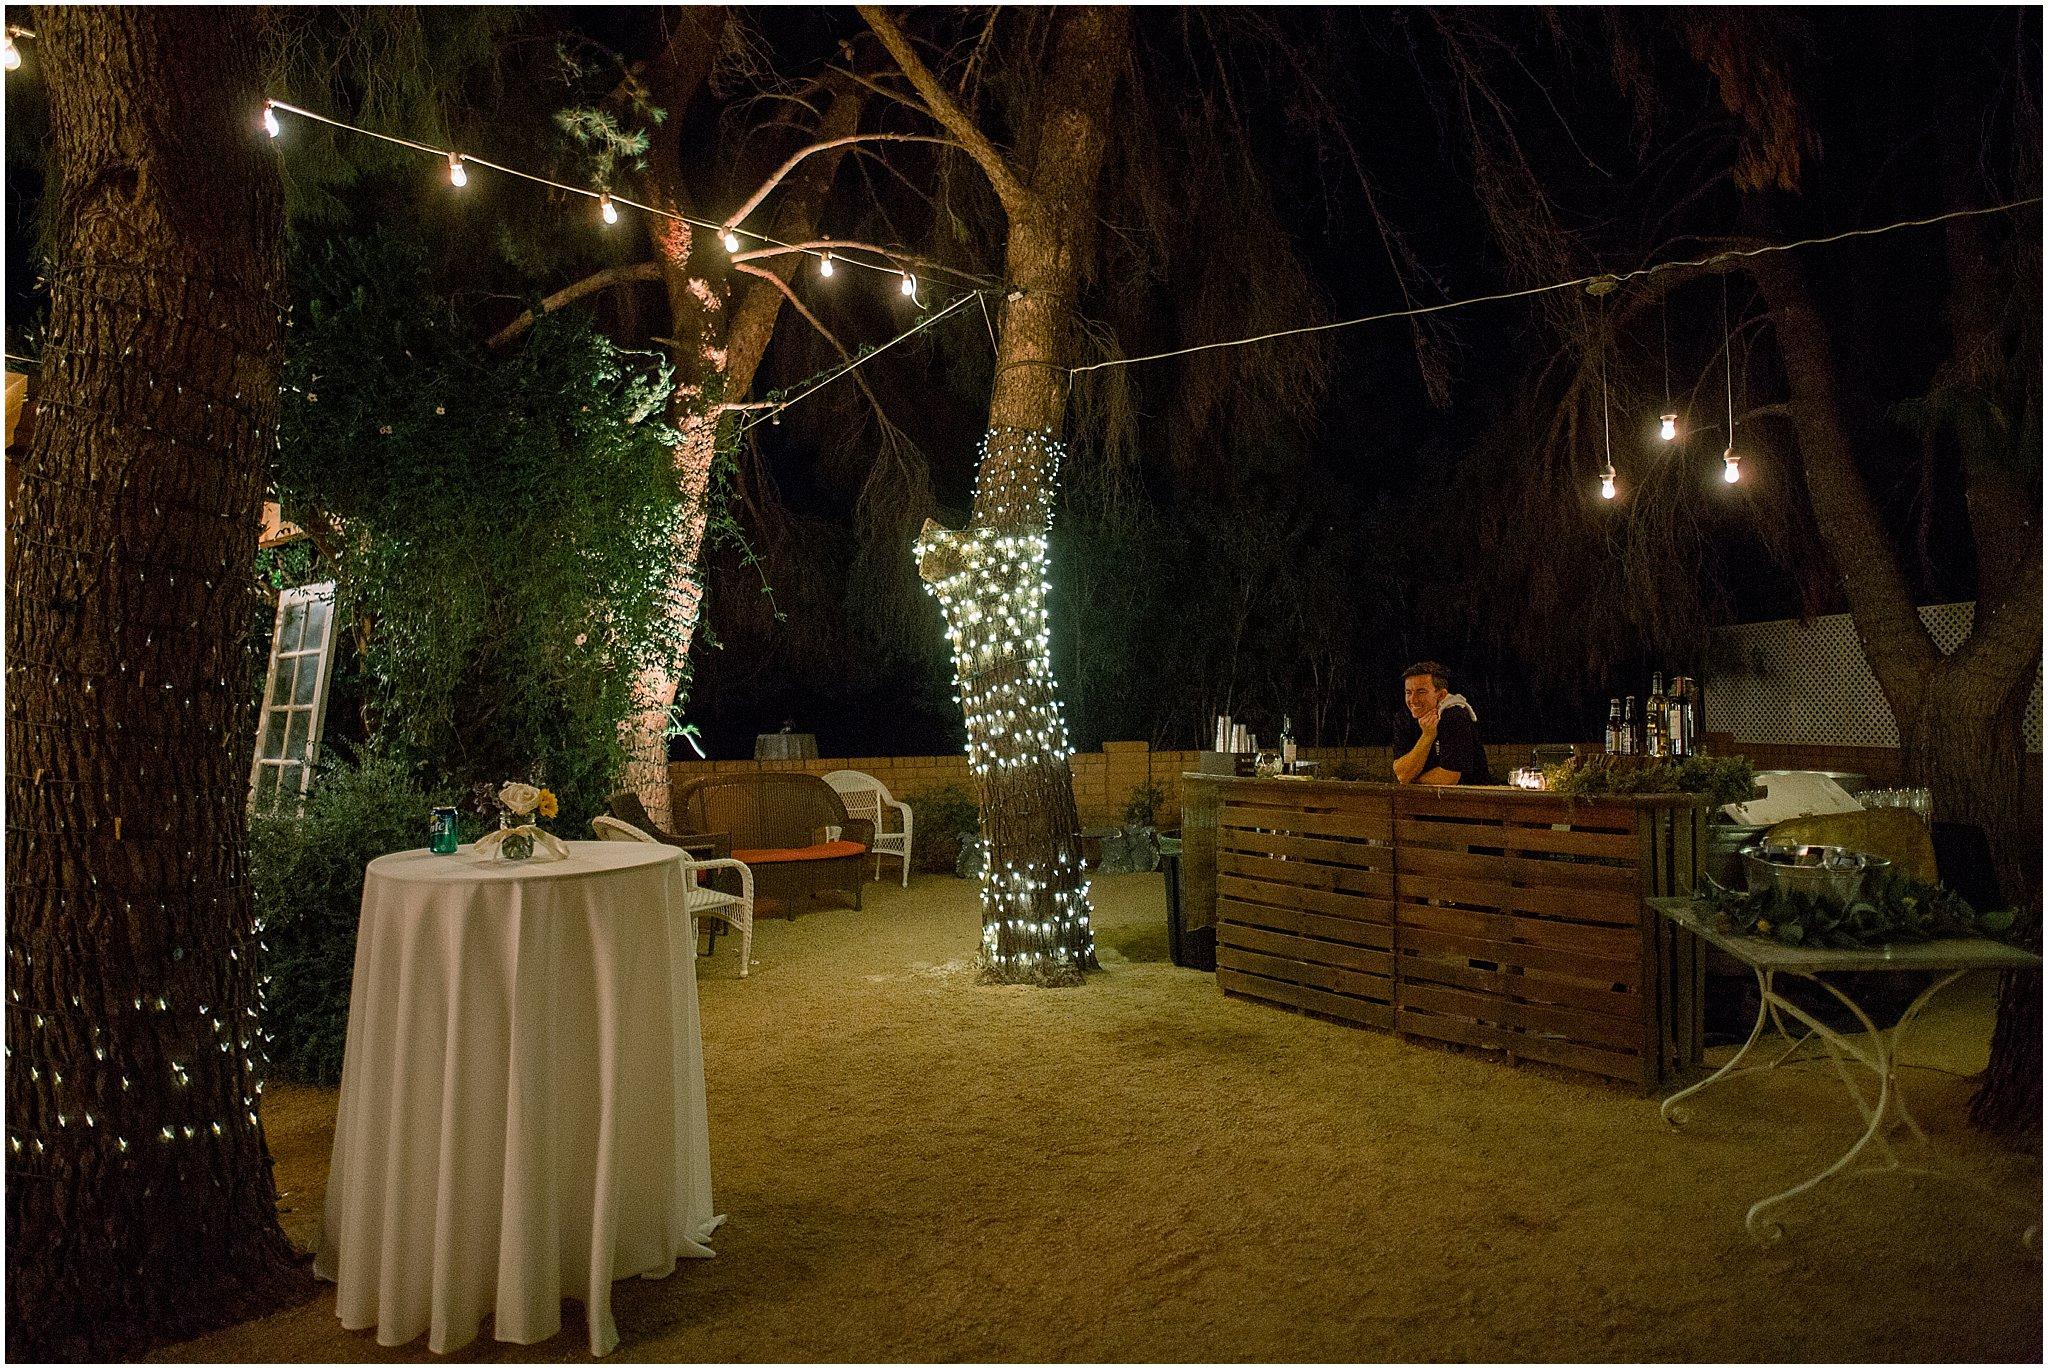 schnepf-farms-queen-creek-arizona-wedding_0004.jpg